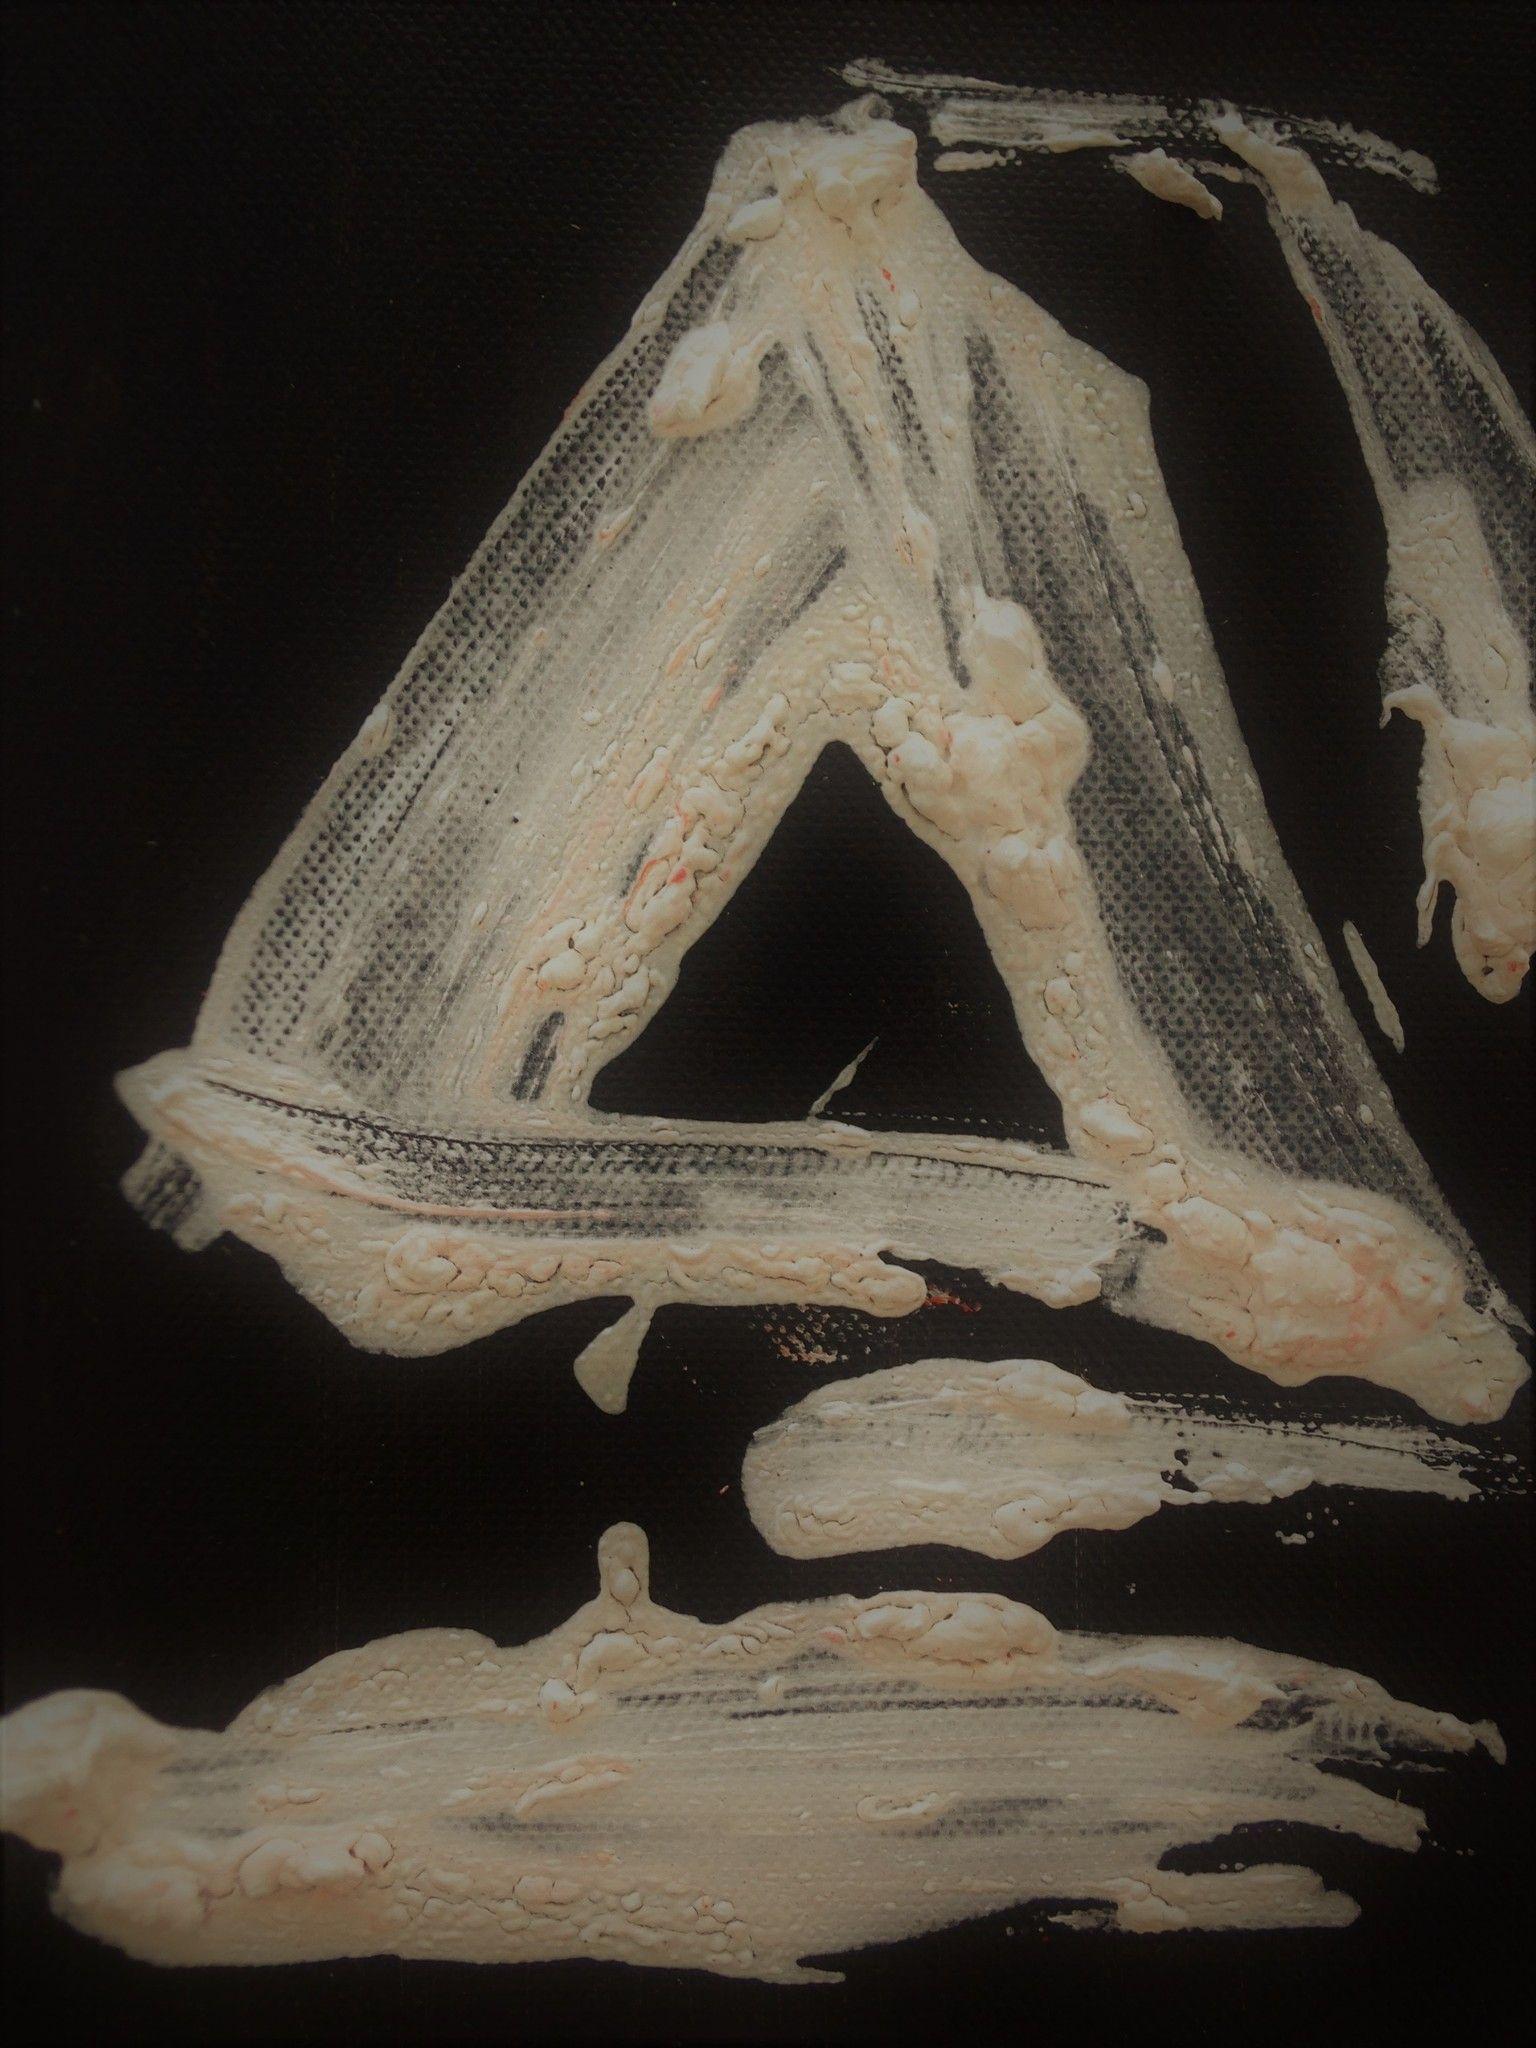 MIXED MEDIA  GABRIELLA TOLLI ' PRISMA-CUBO-PIRAMIDE '  dimensioni L 54 x H 24 cm.